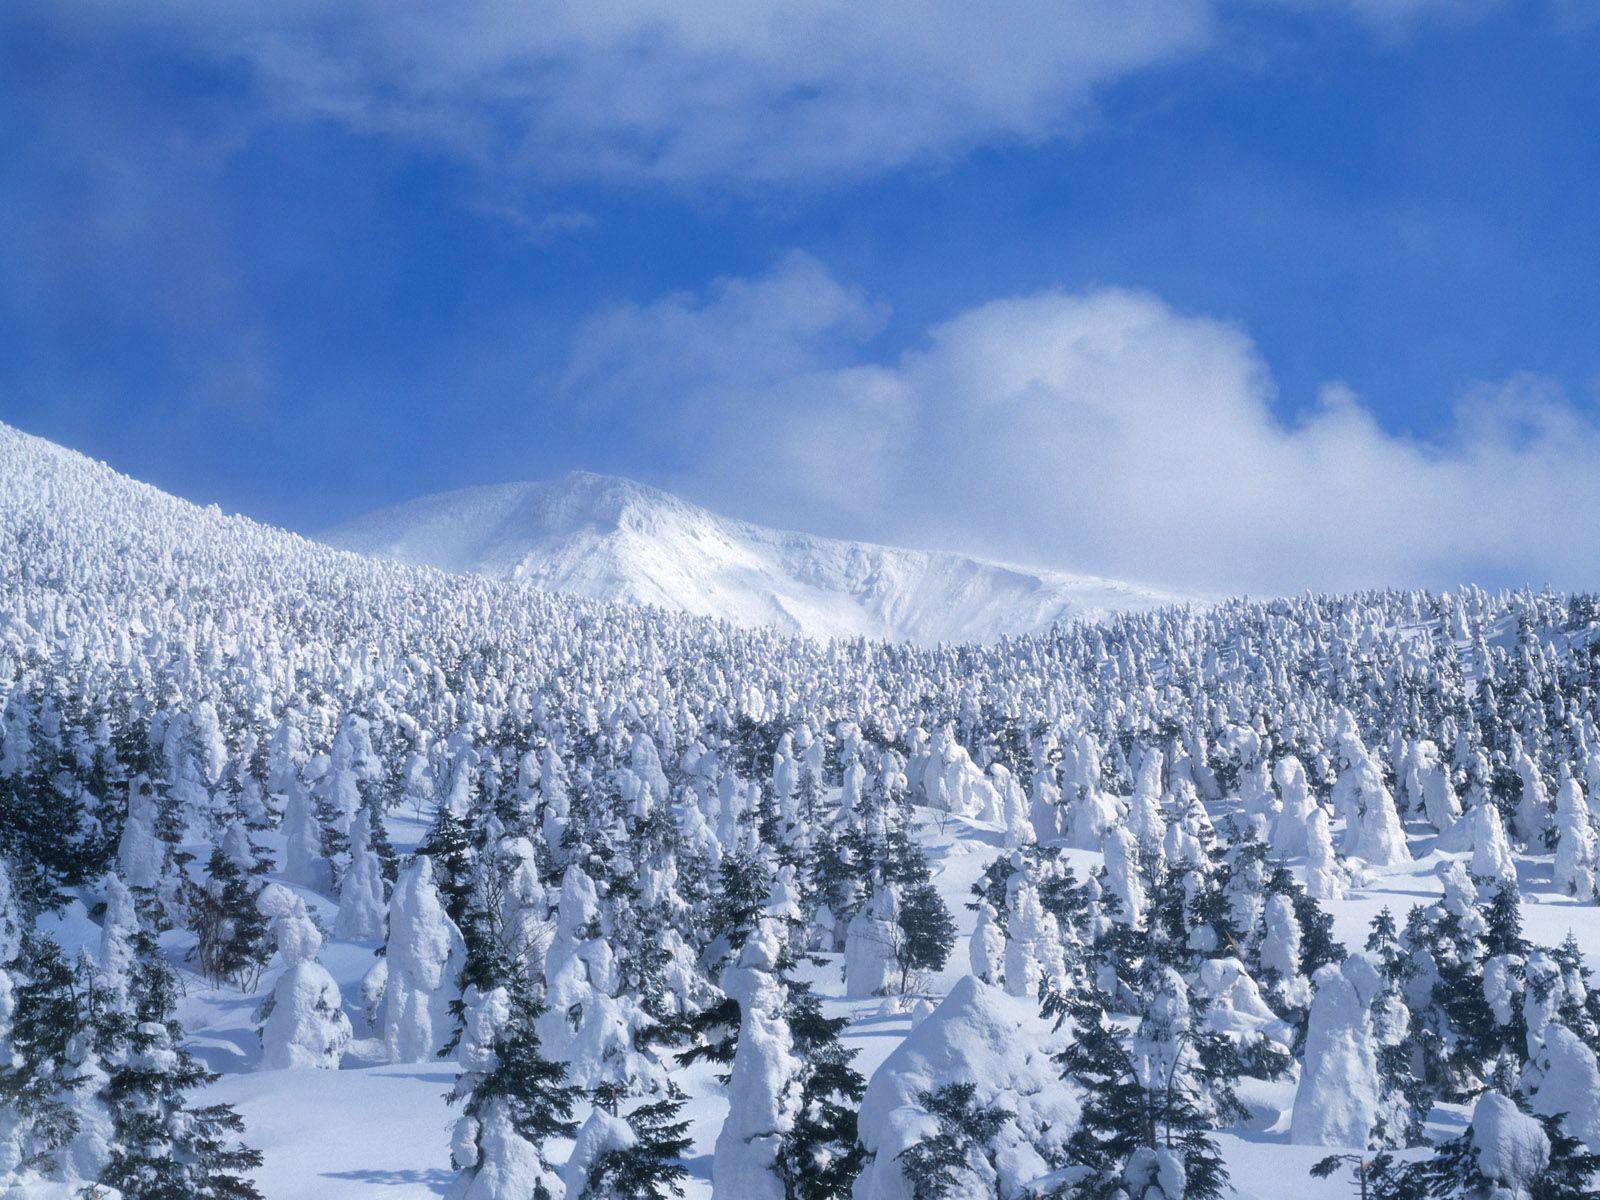 High Resolution Wallpaper Winter: Snow Scenes Desktop Background